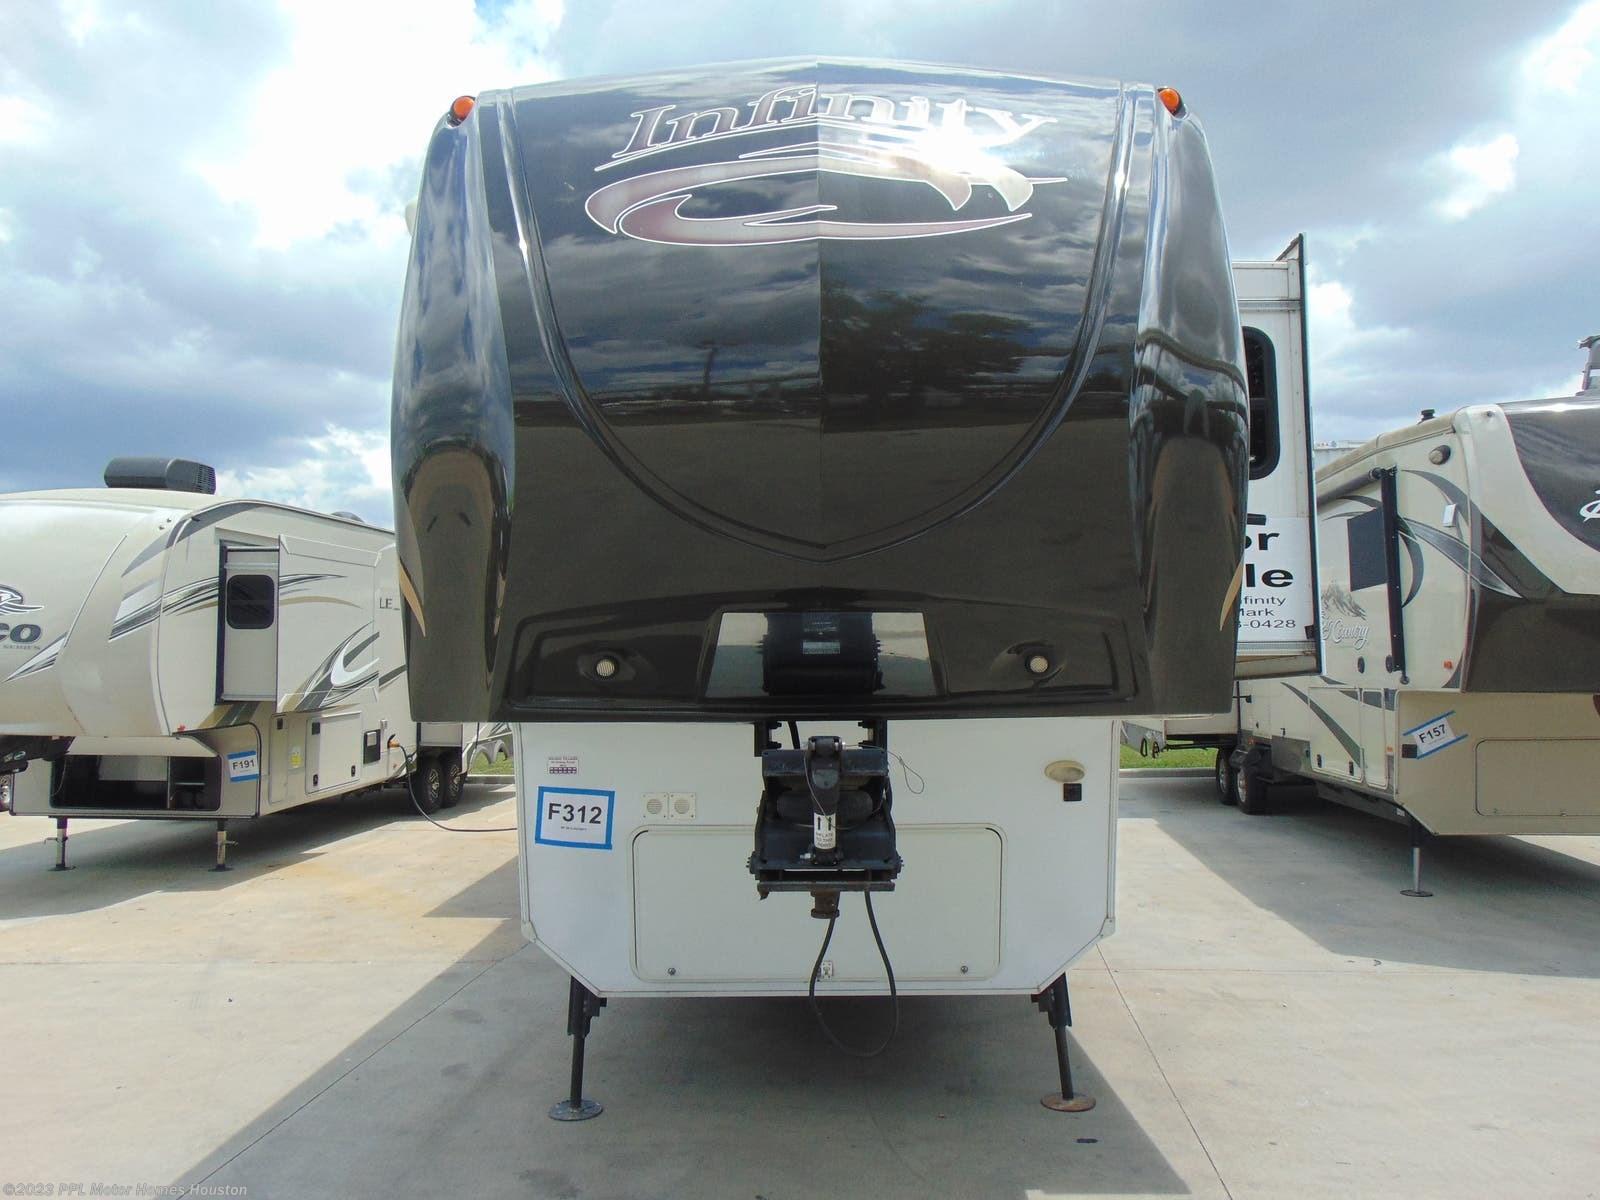 Used Rv Houston >> 2012 Dutchmen Rv Infinity 3850rl For Sale In Houston Tx 77074 F312